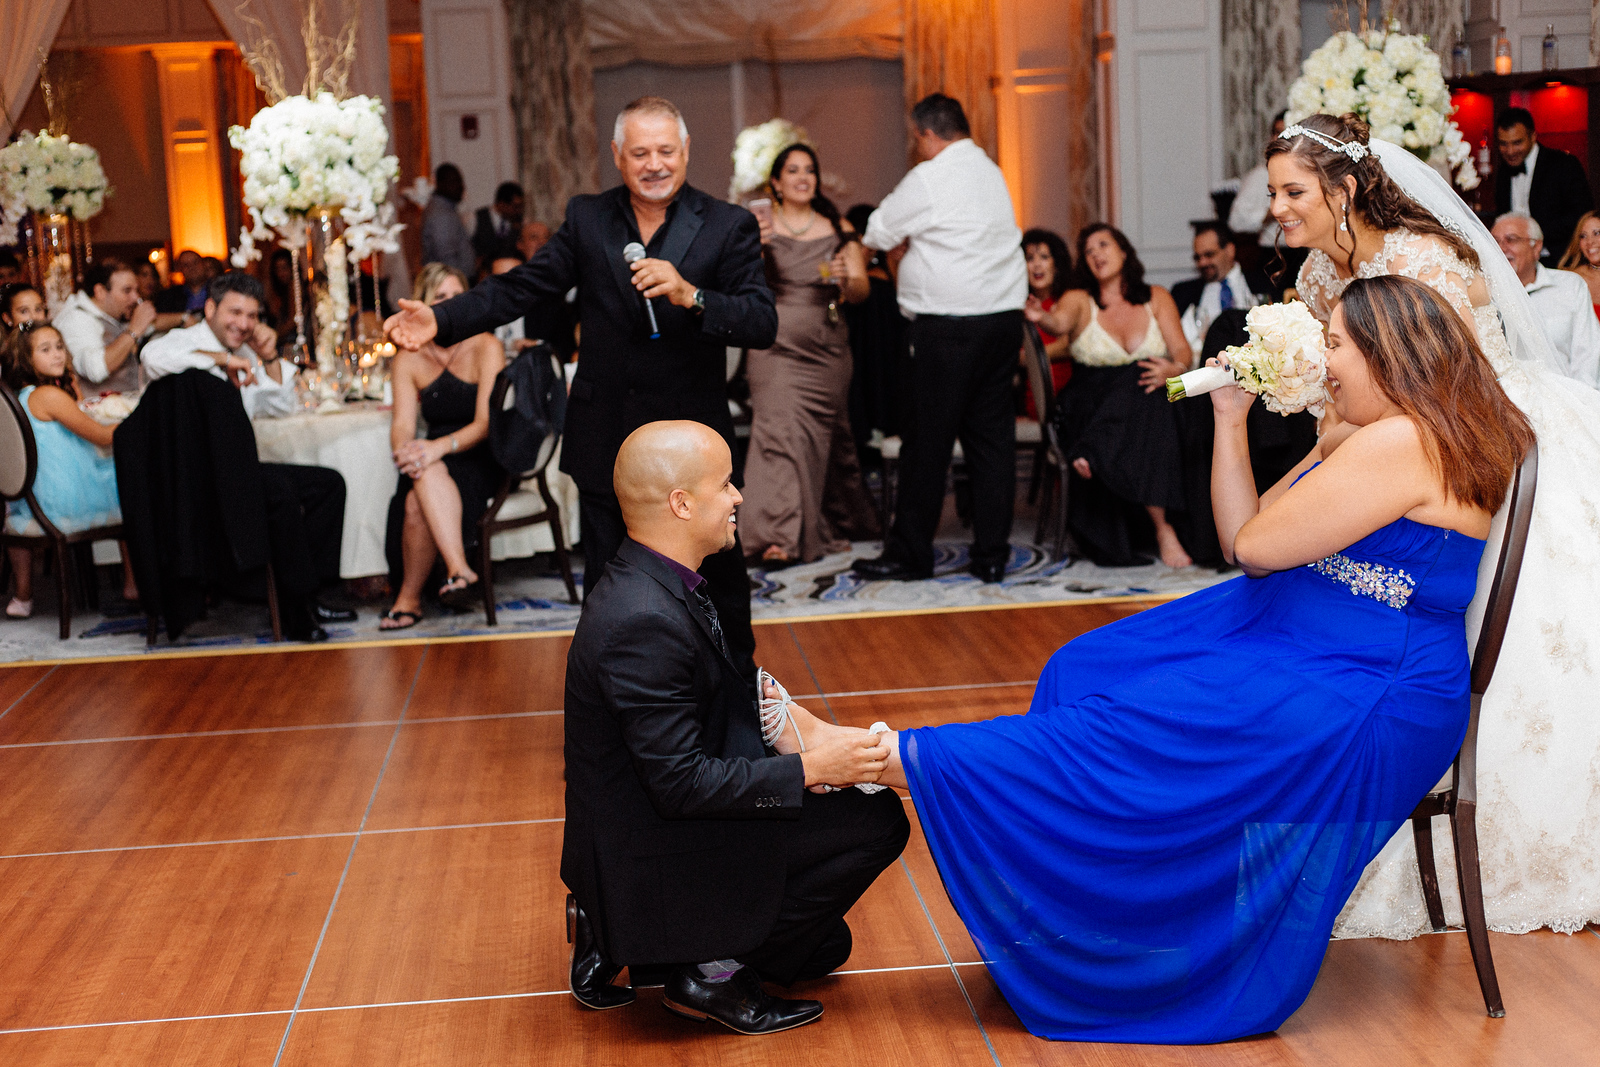 South-Florida-Wedding-Photographer-Andreo-5D3_5447